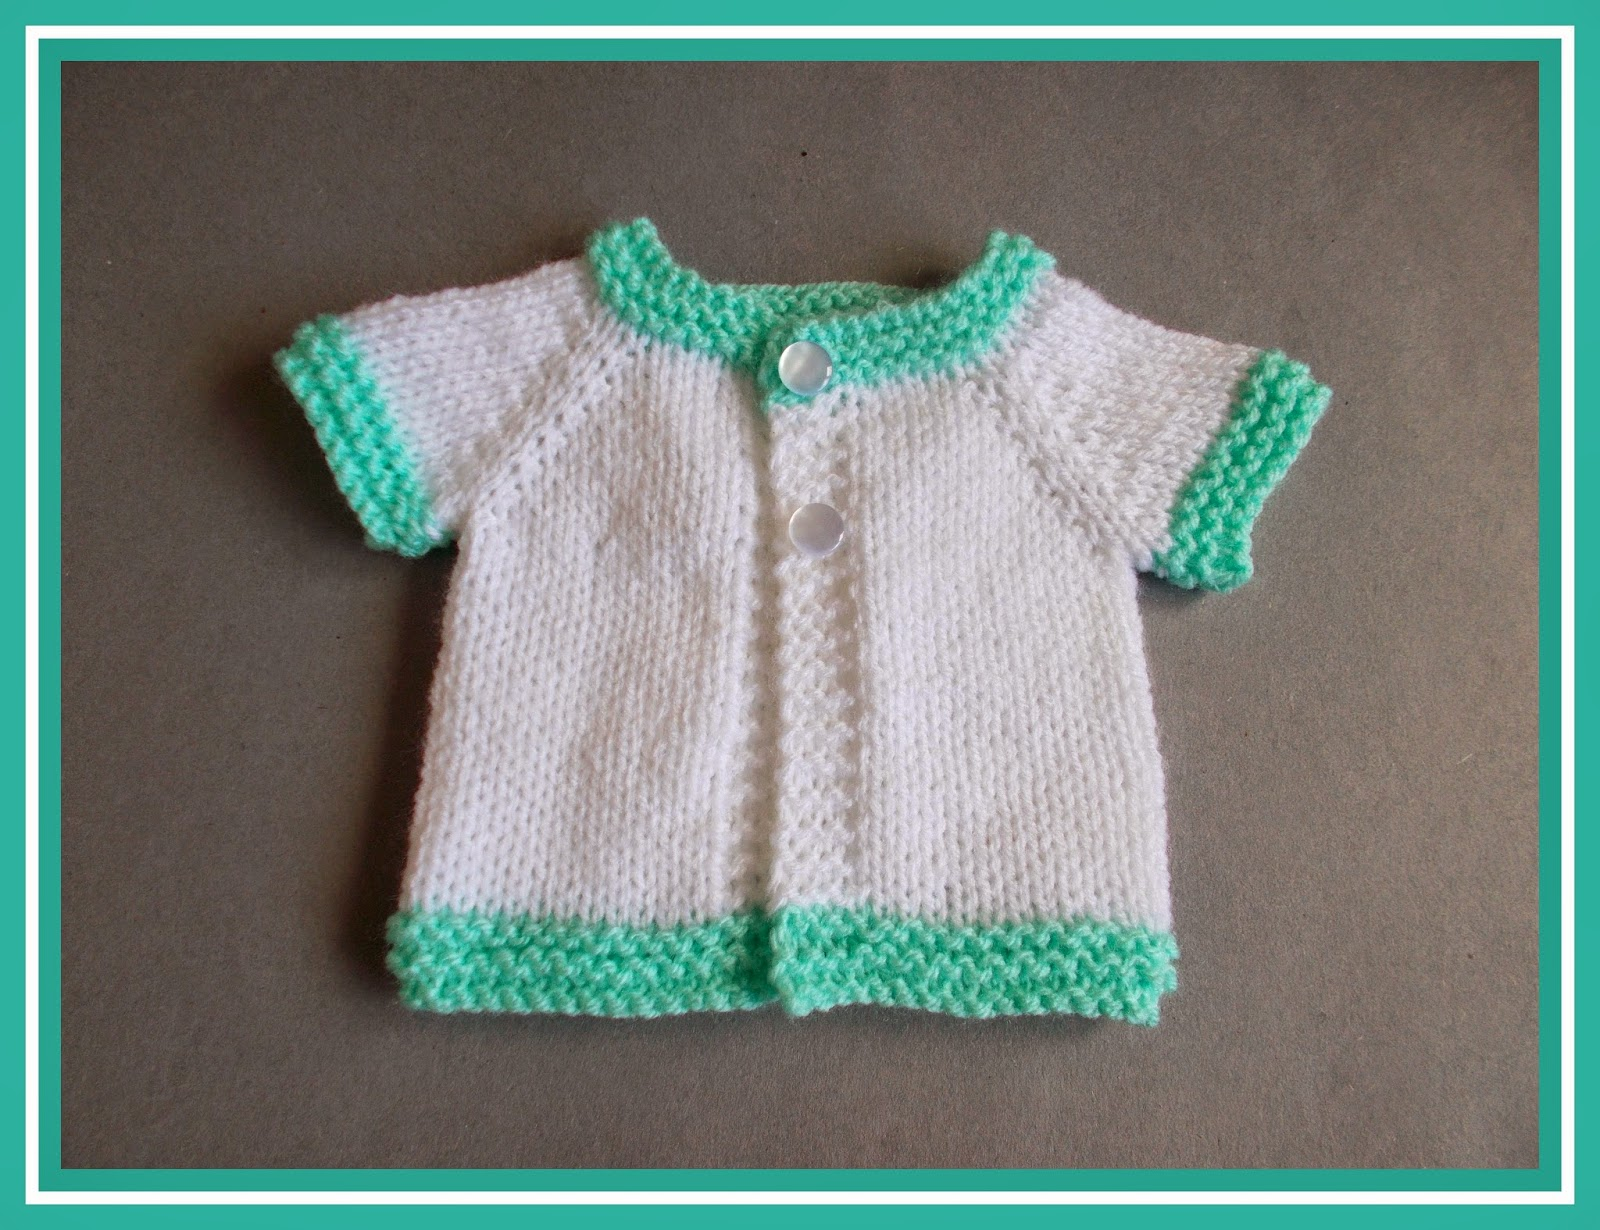 66af7f20b0f9 Marianna s Lazy Daisy Days  Topaz - Premature Baby Cardi